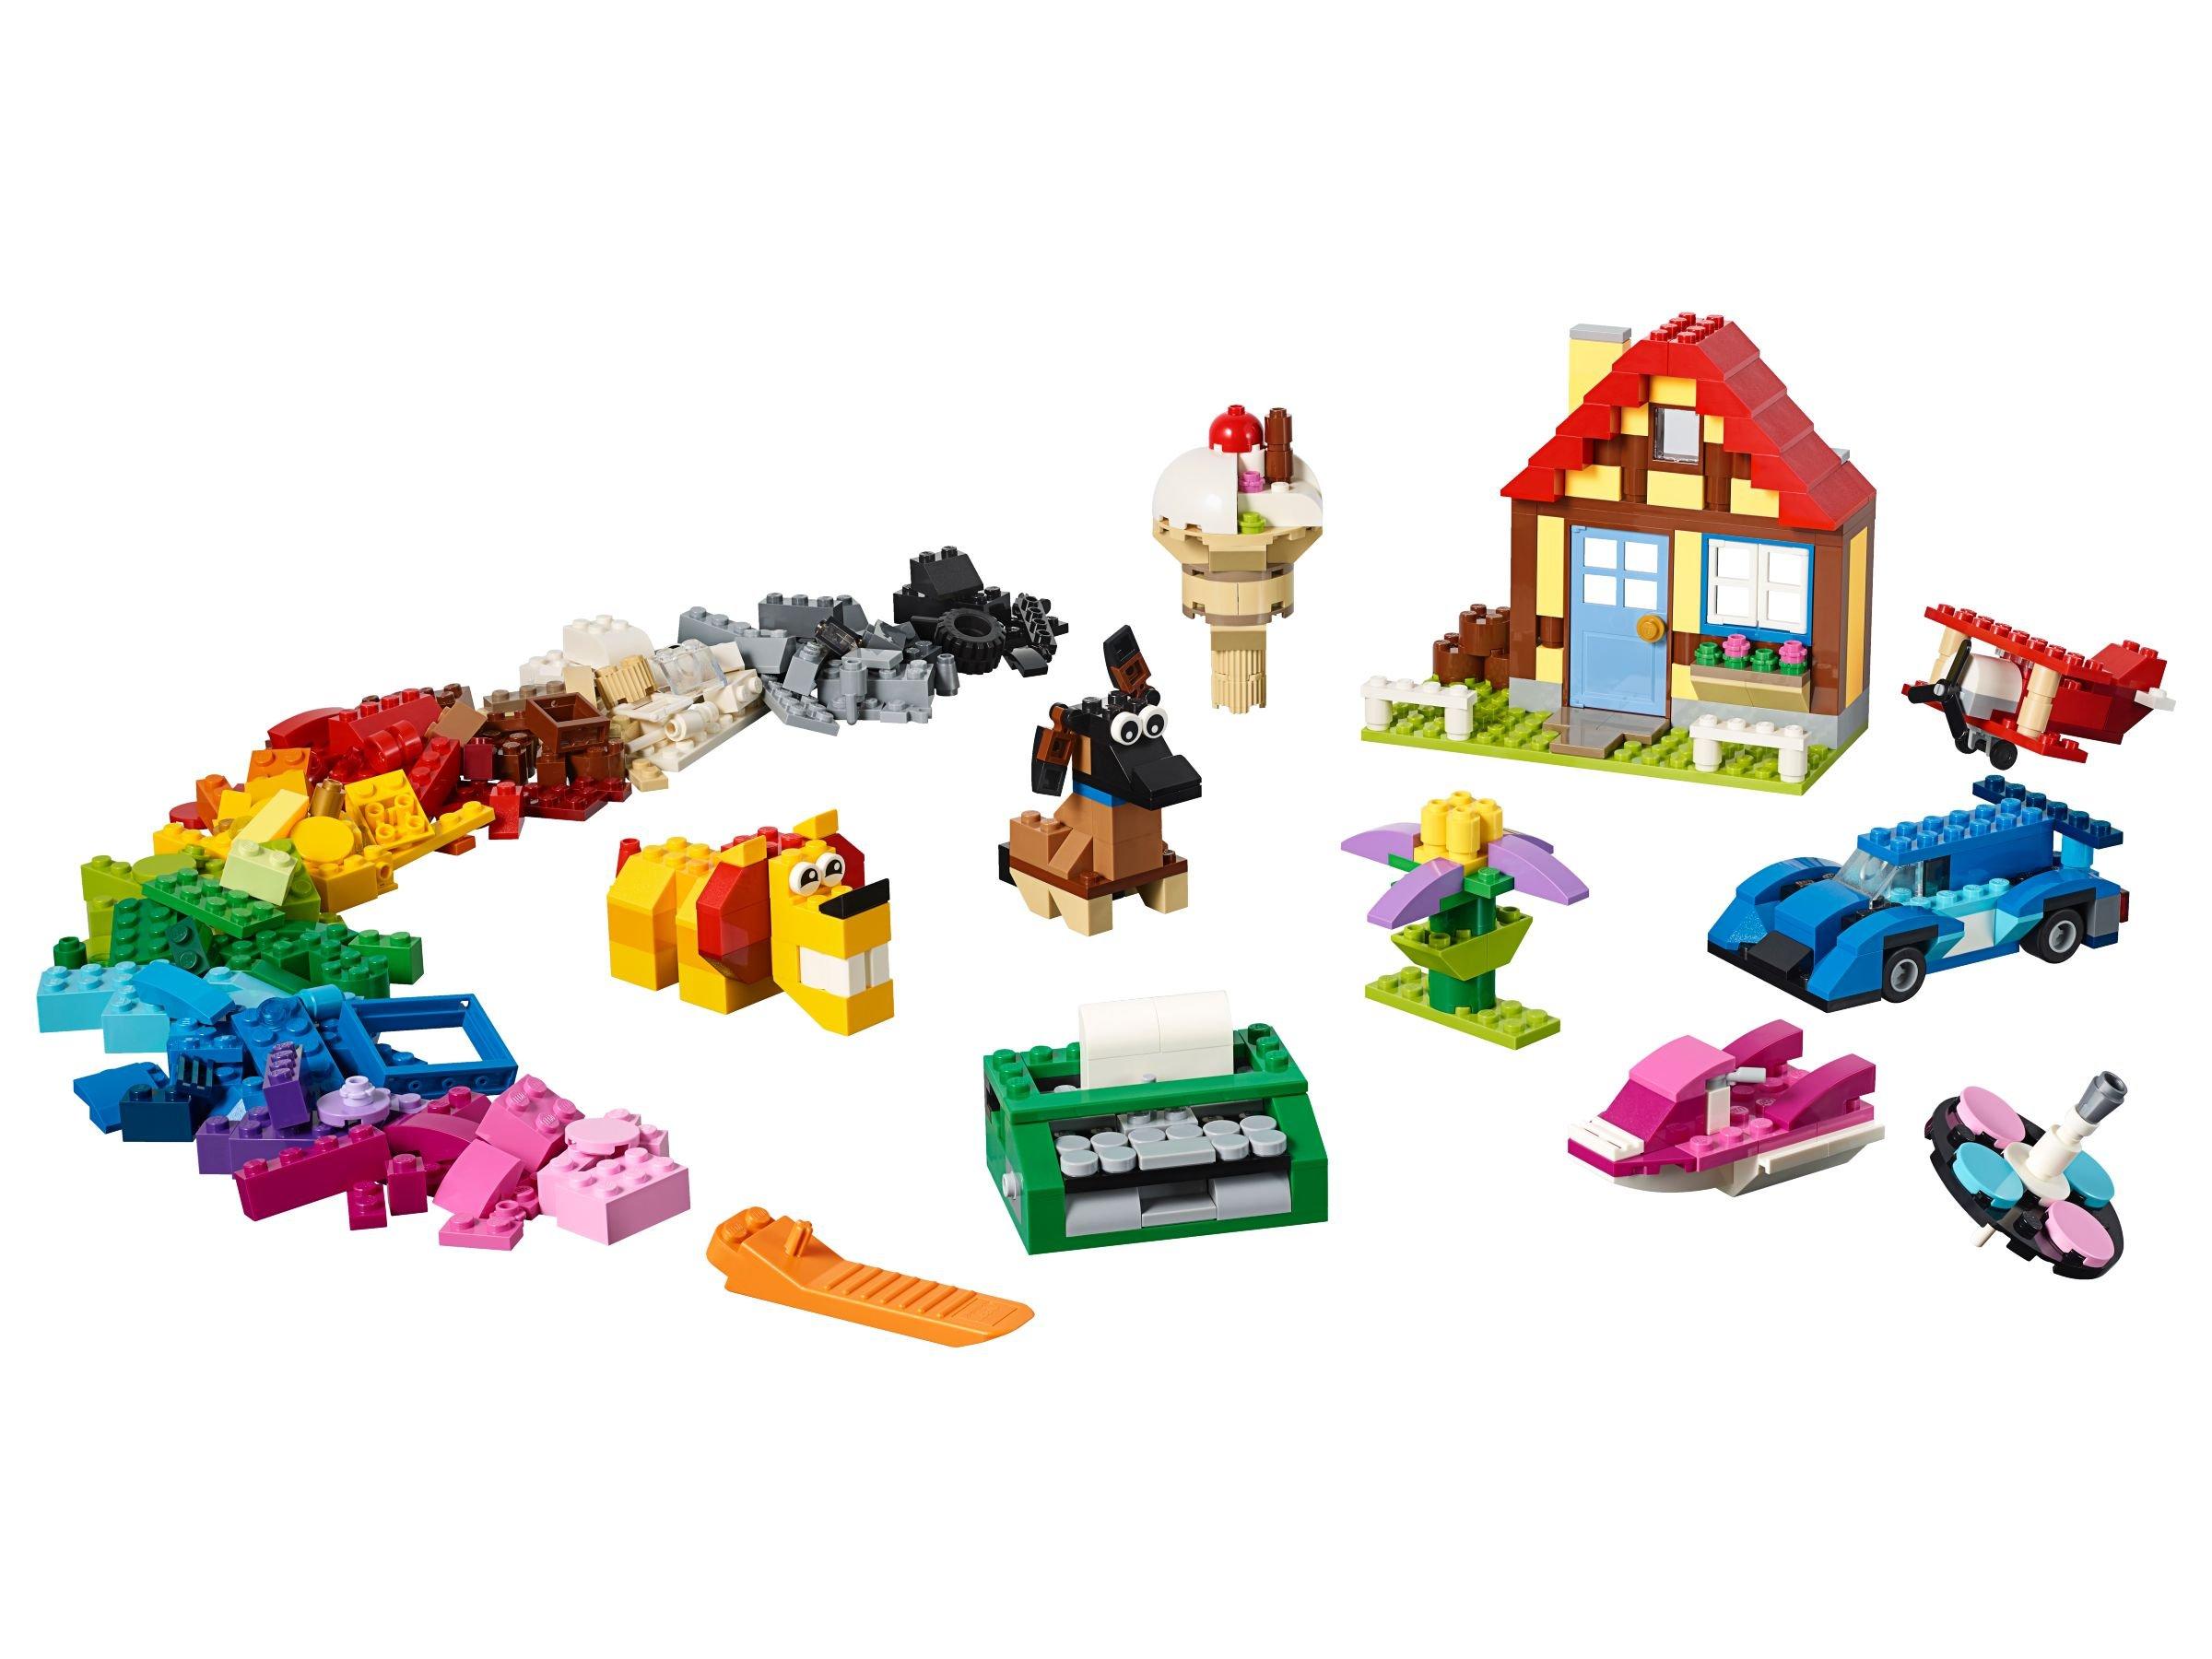 Lego Classic 11005 Lego Bausteine Kreativer Spielspaß Ab 2999